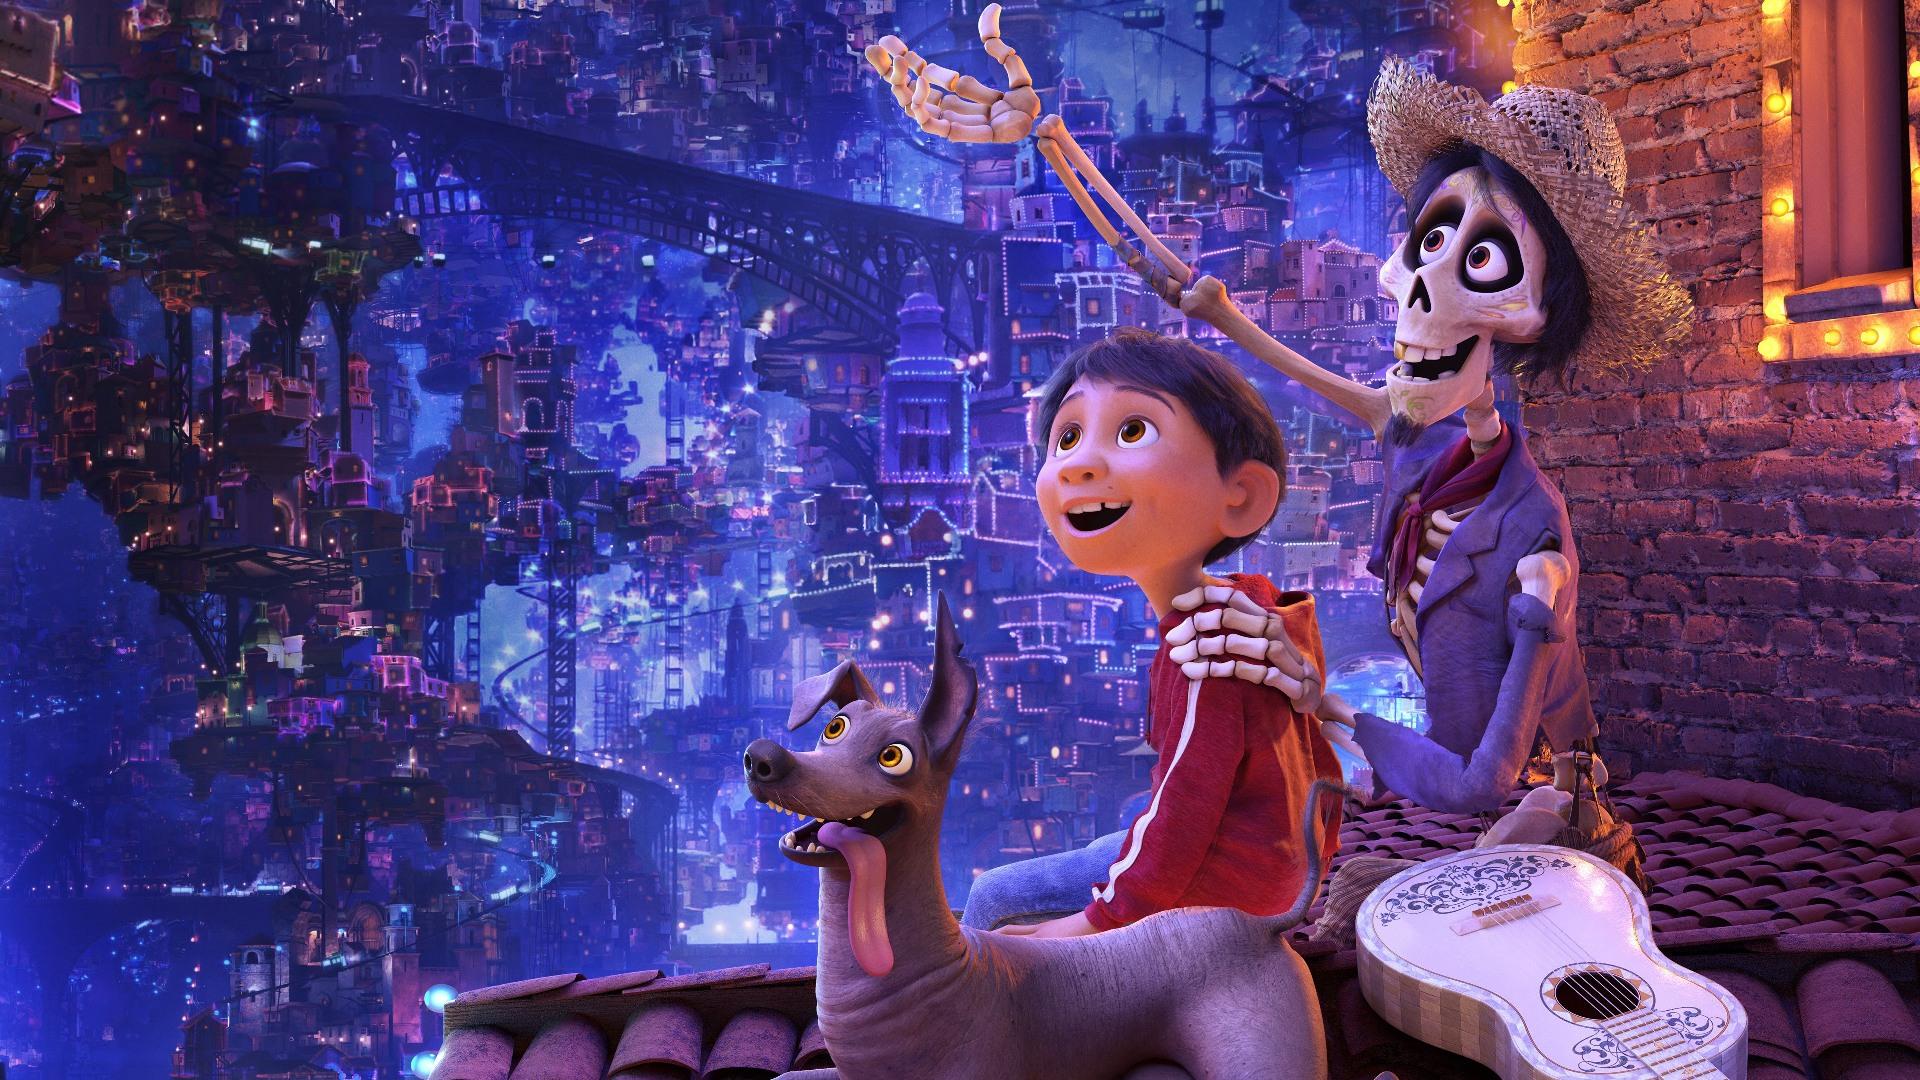 Disney Pixar's COCO - Special screening in Spanish!